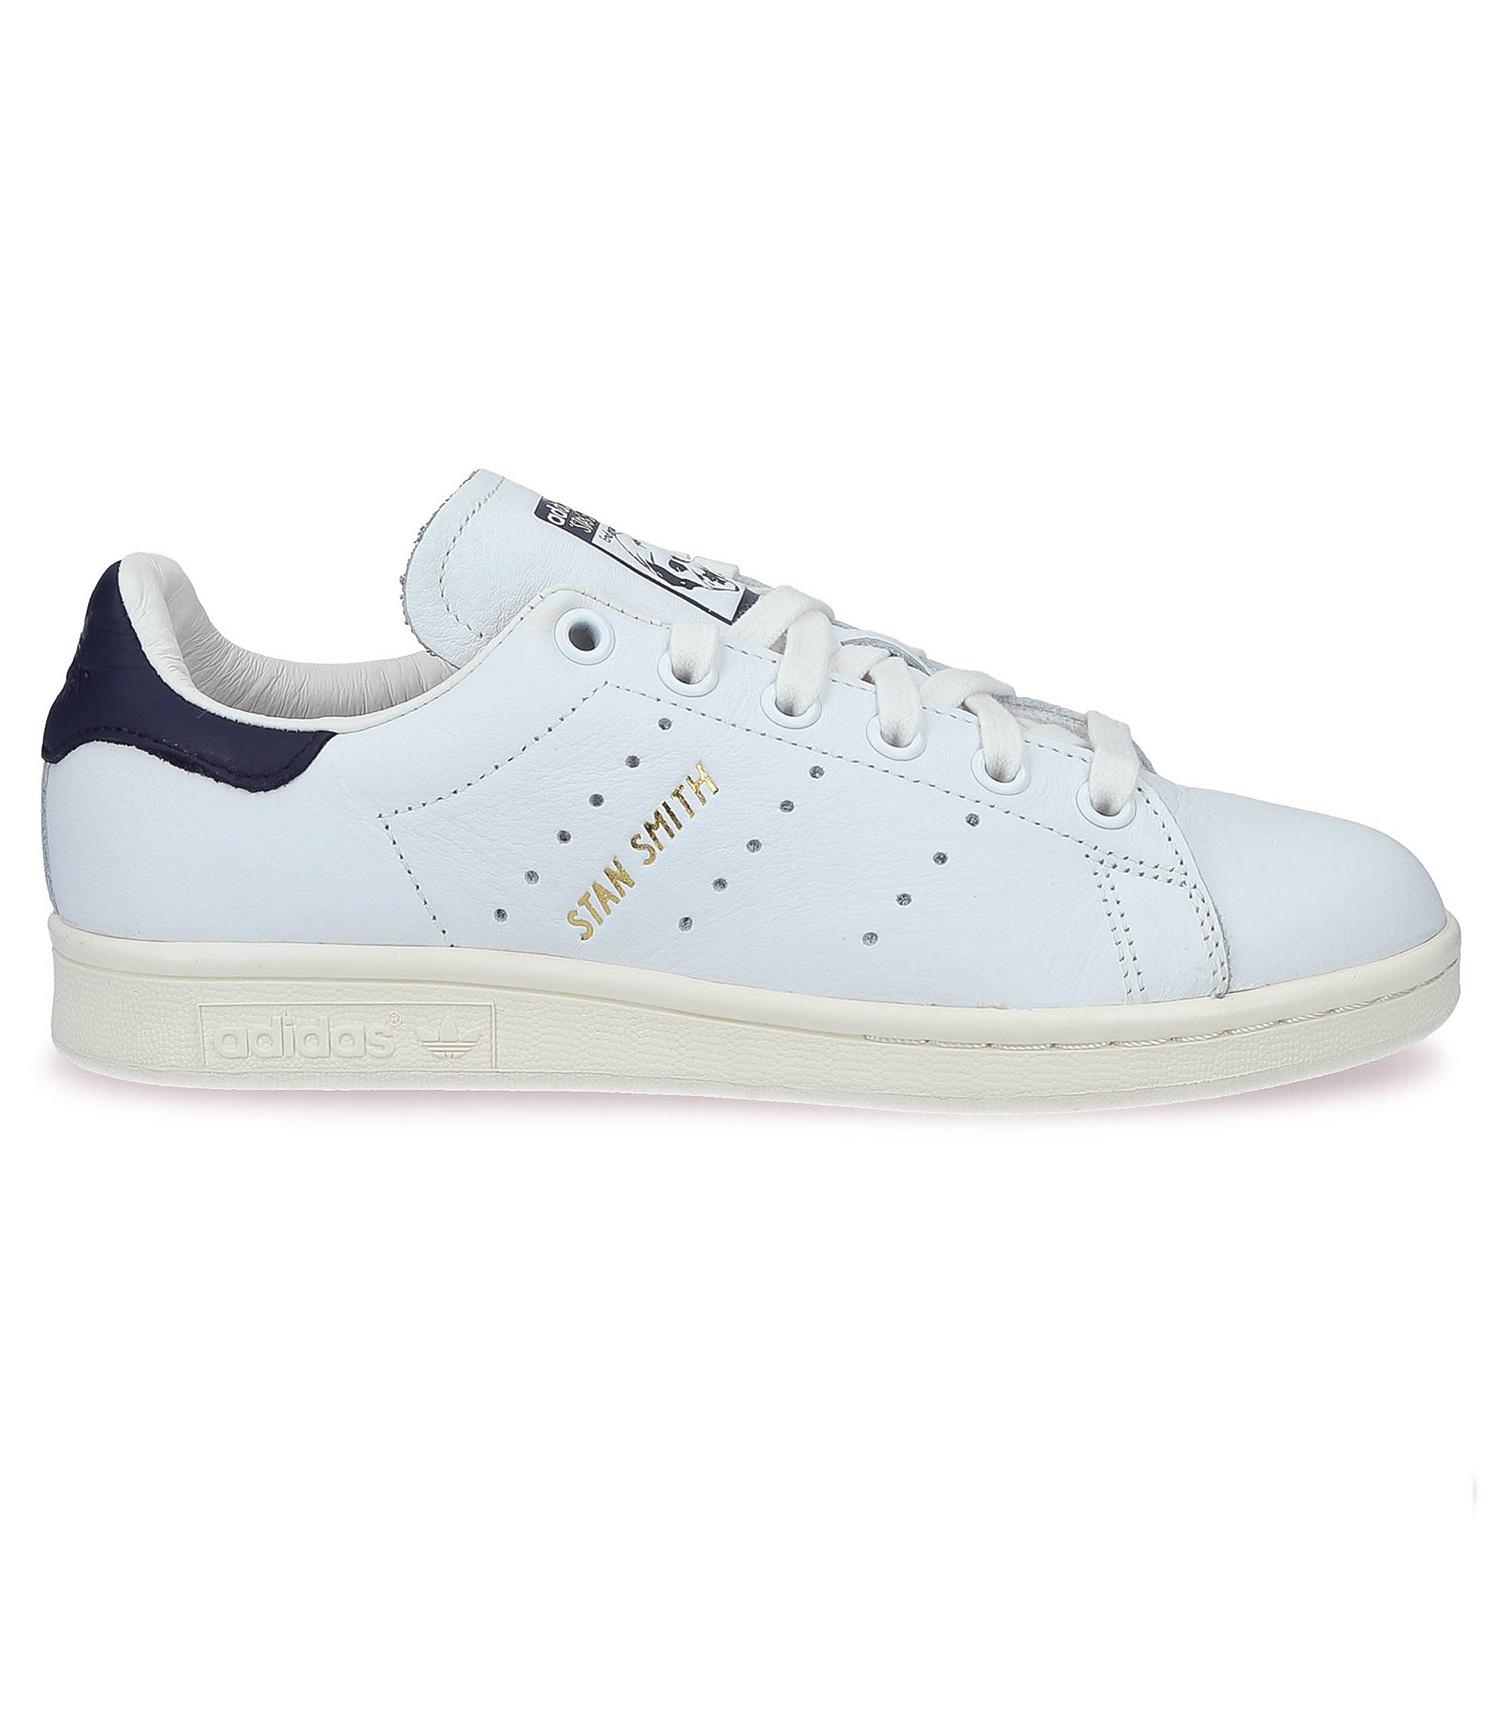 adidas Originals Stan Smith Baskets en cuir Blanc et bleu marine